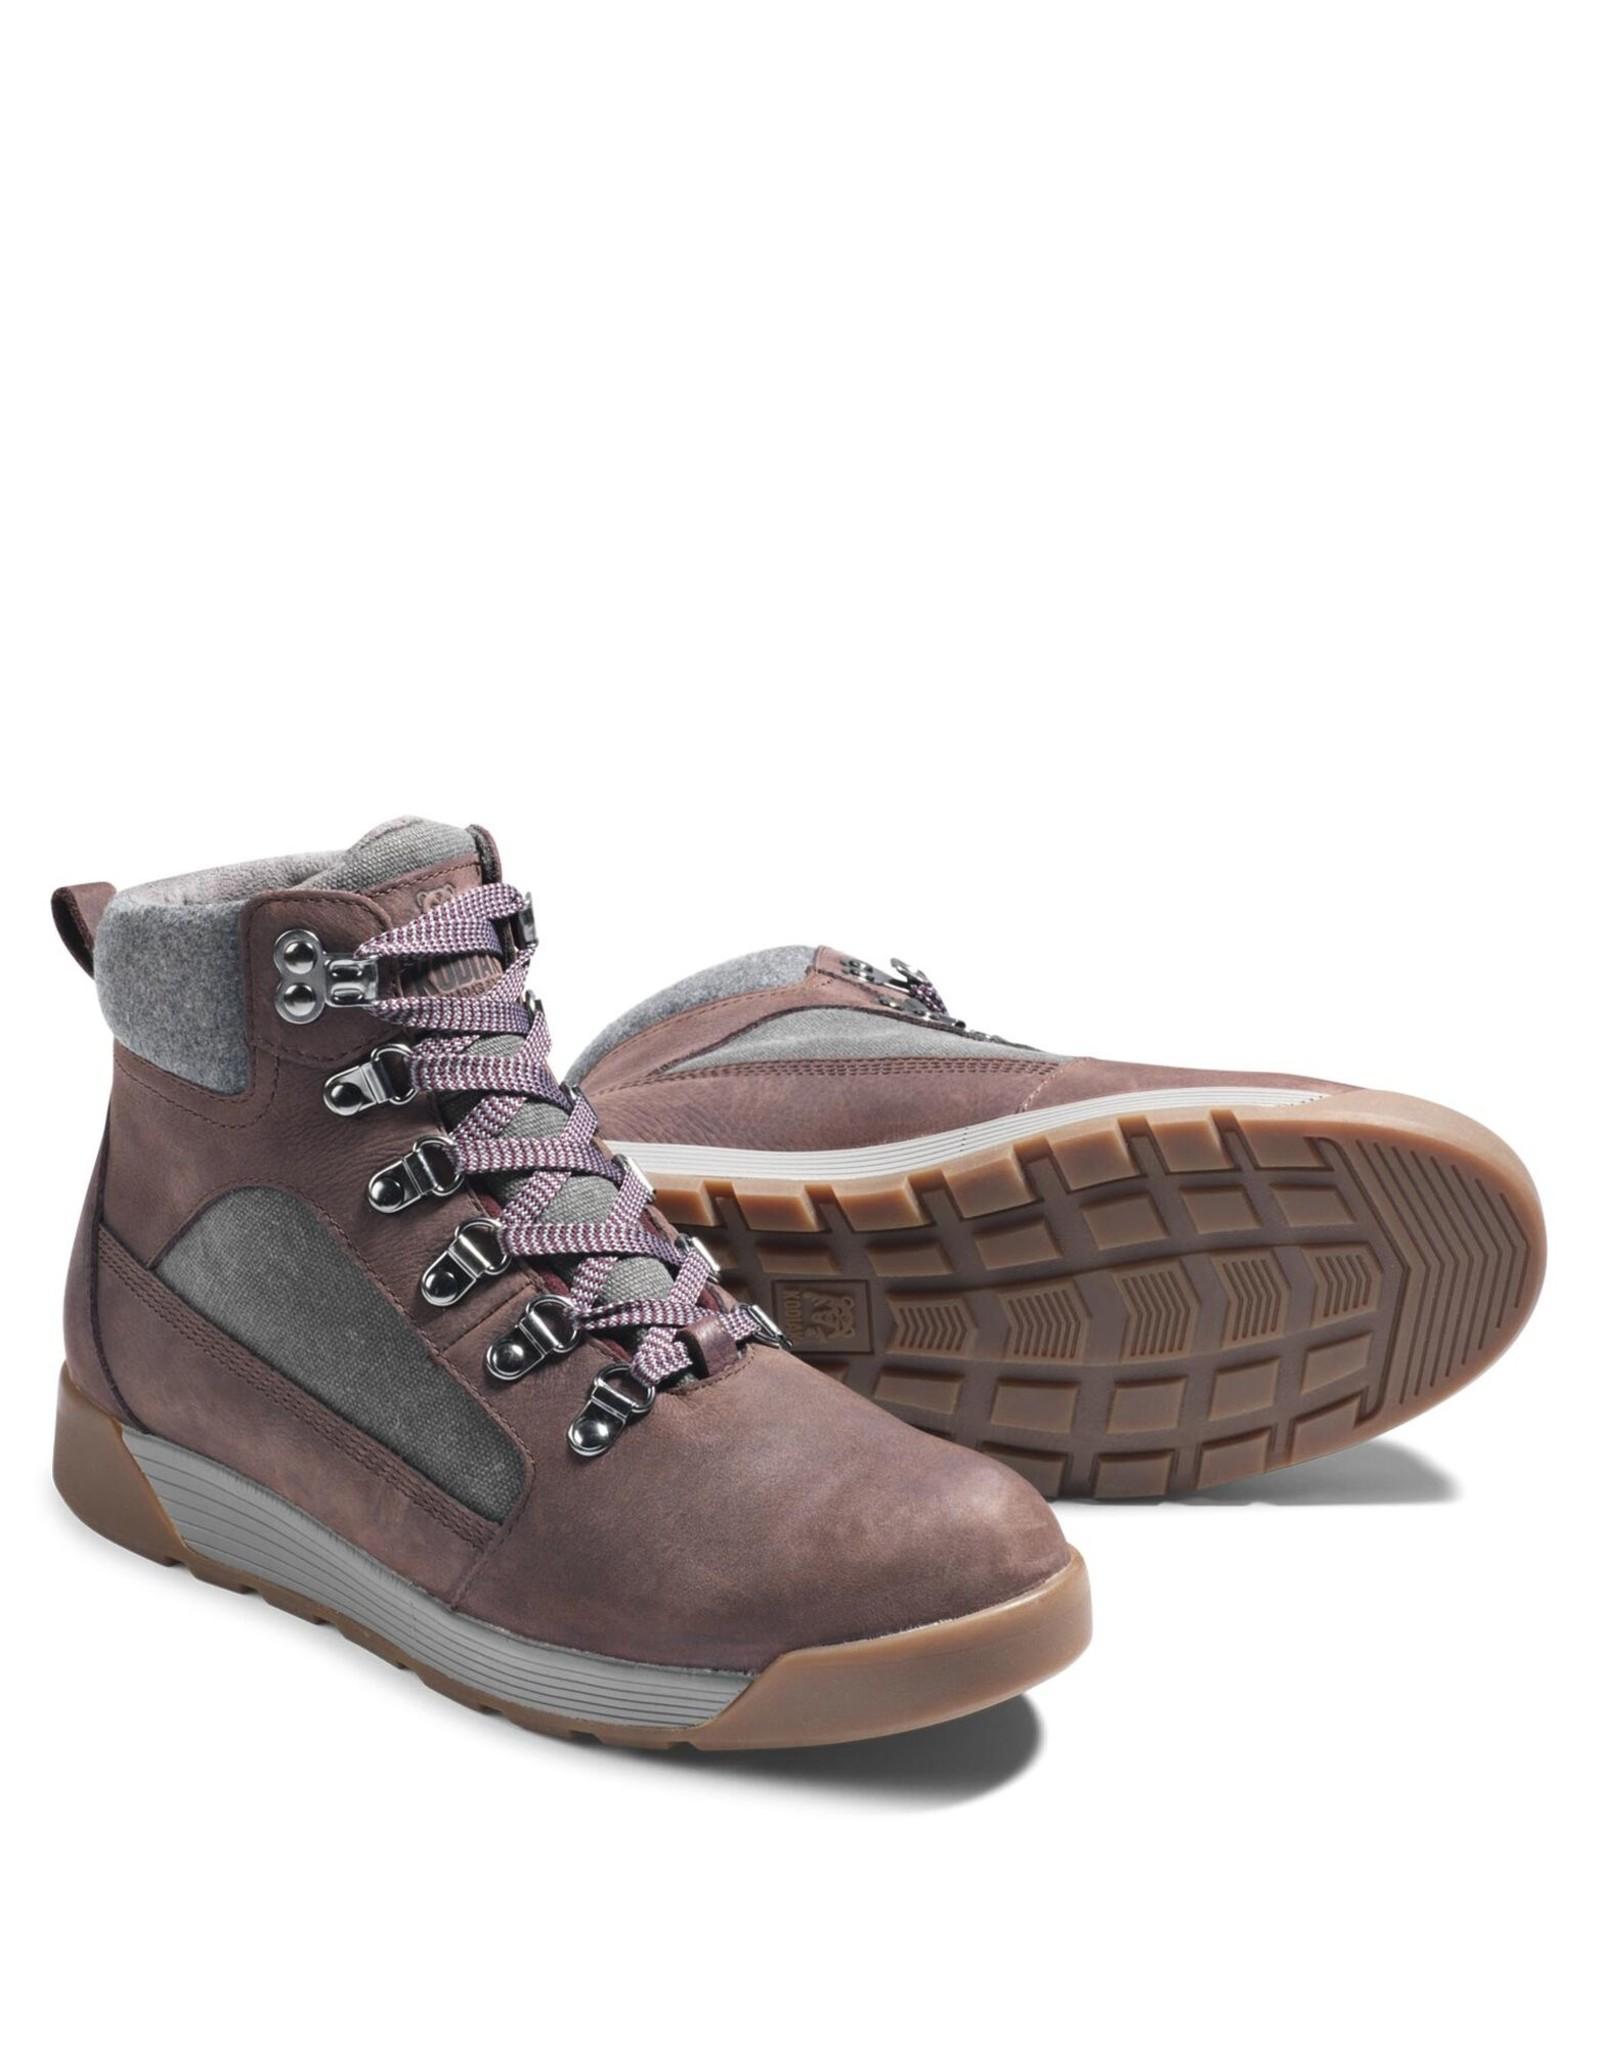 Kodiak Women's 5 Inch Fundy Boot -SP - 91af